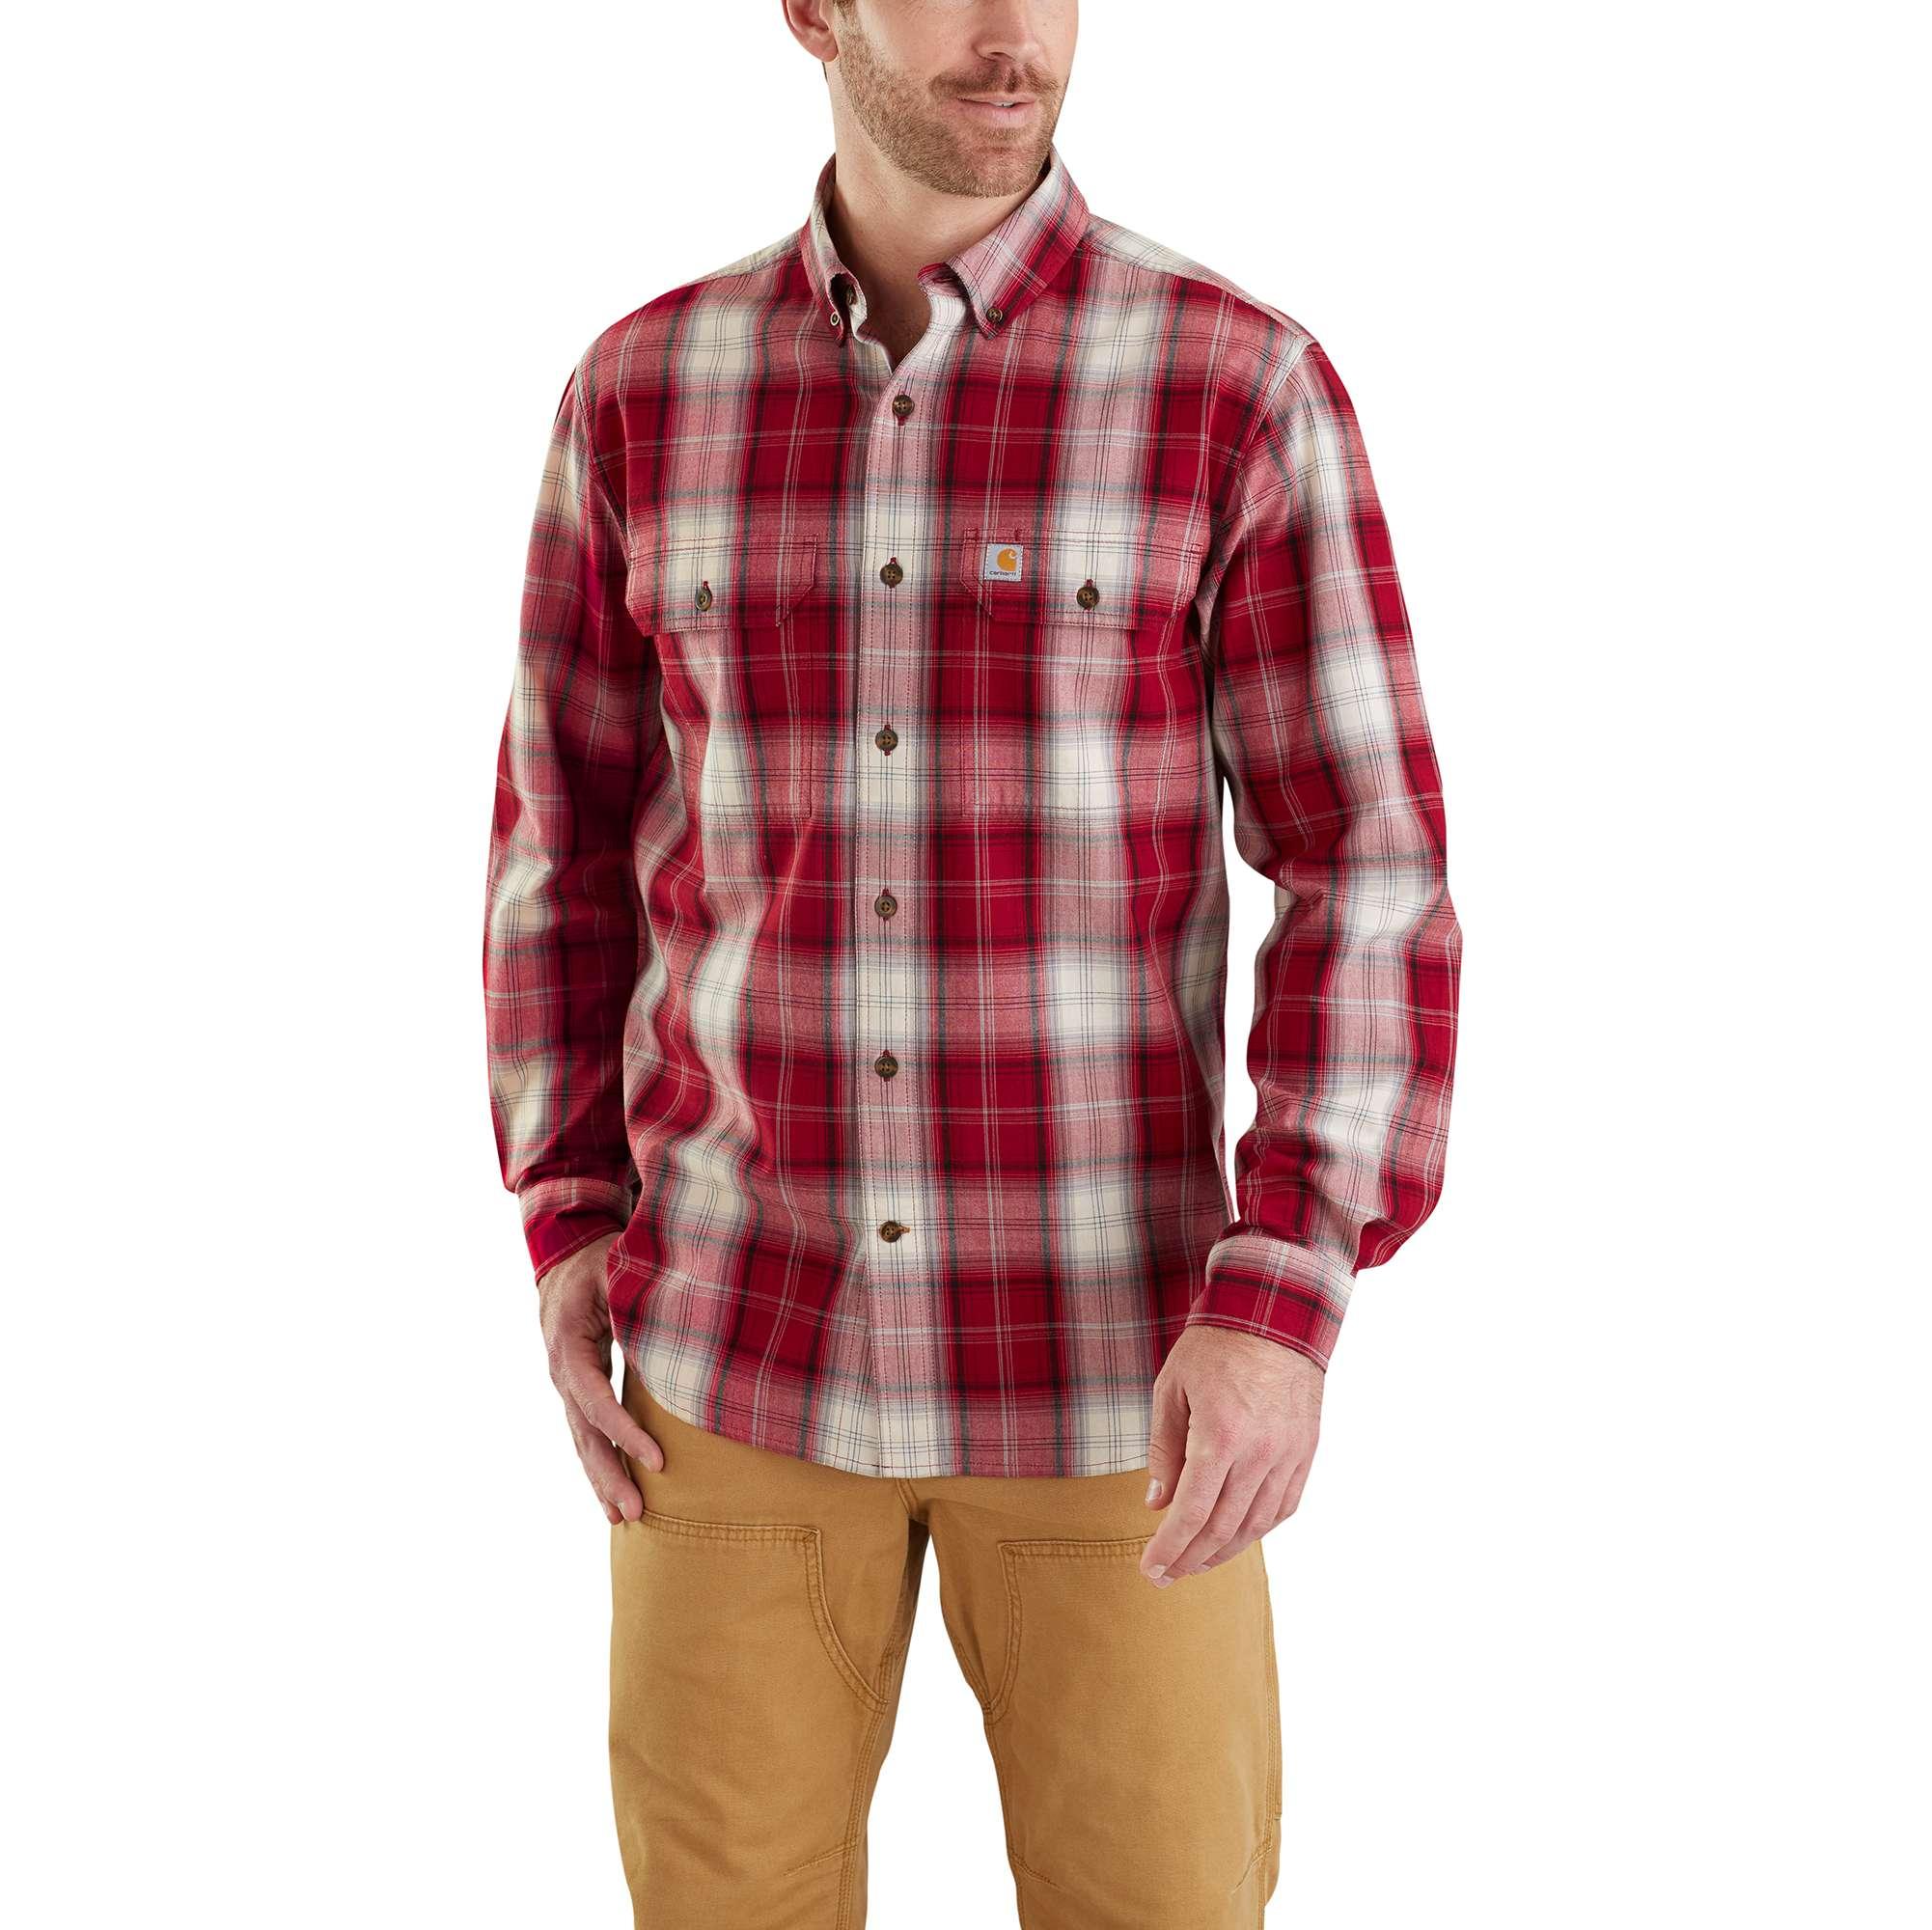 Men's Fort Plaid Long Sleeve Shirt, Crimson, swatch